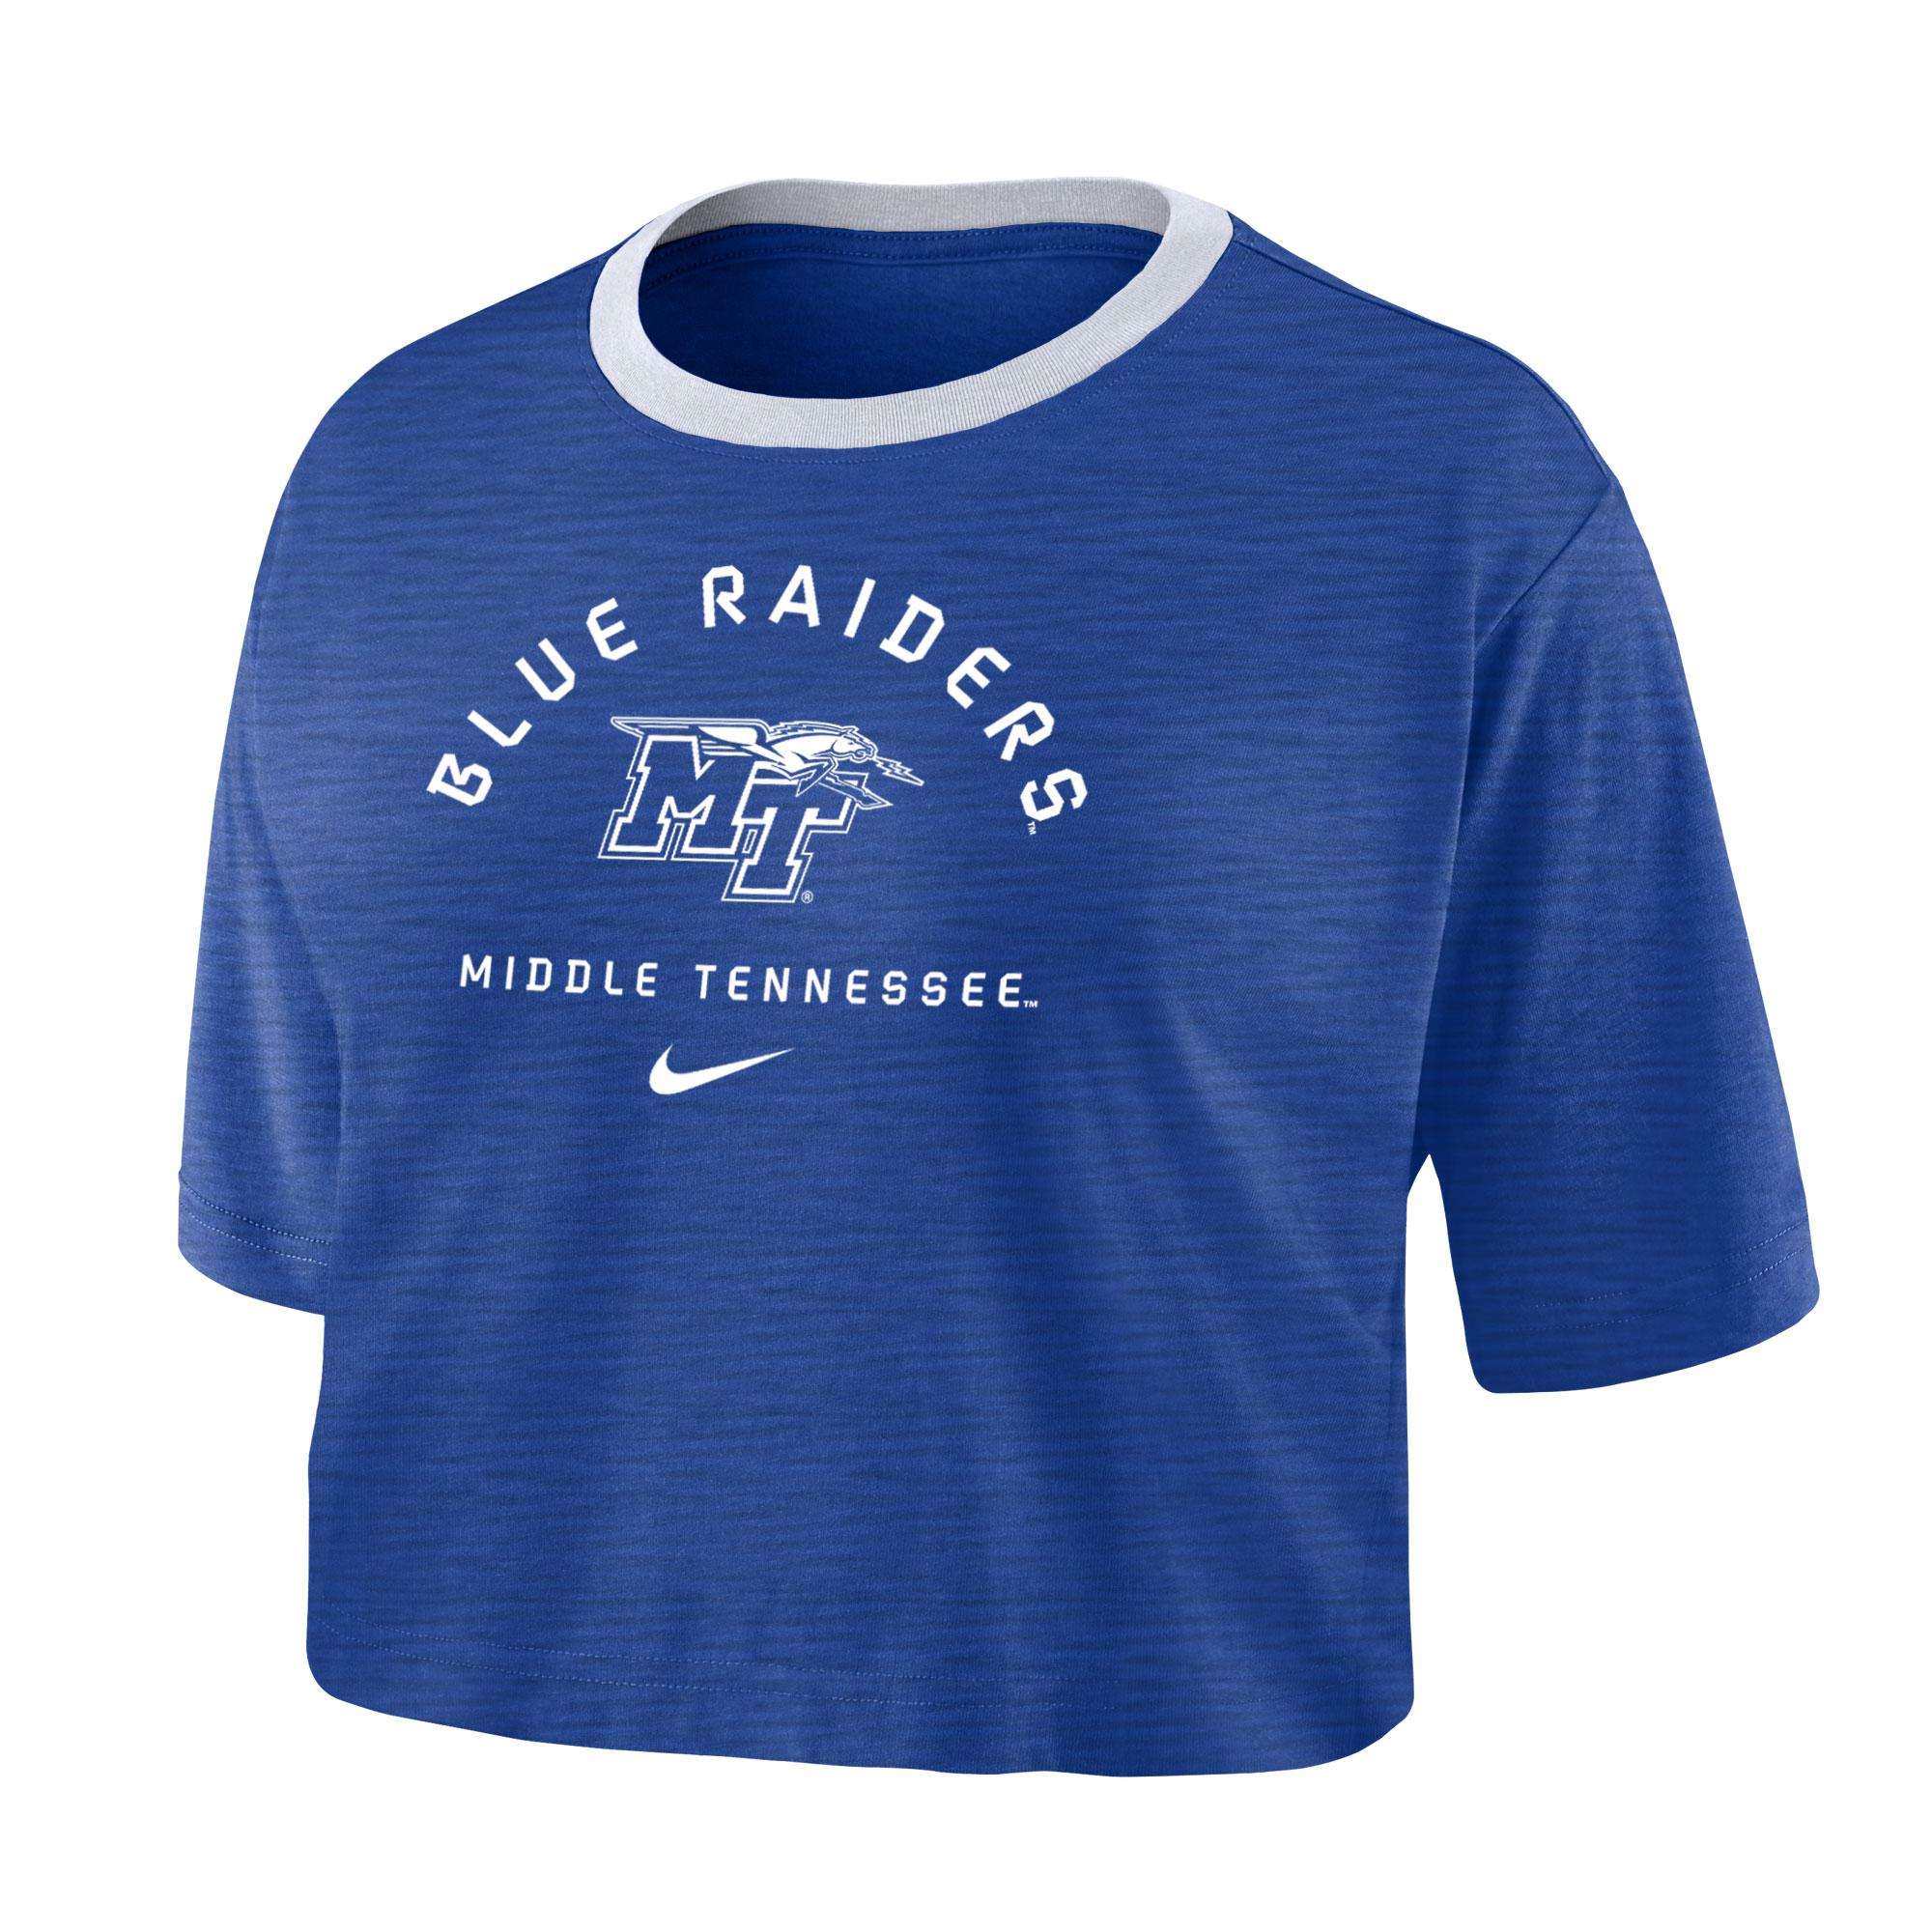 Middle Tennessee Women's Dri-Fit Cotton Nike® Slub Crop